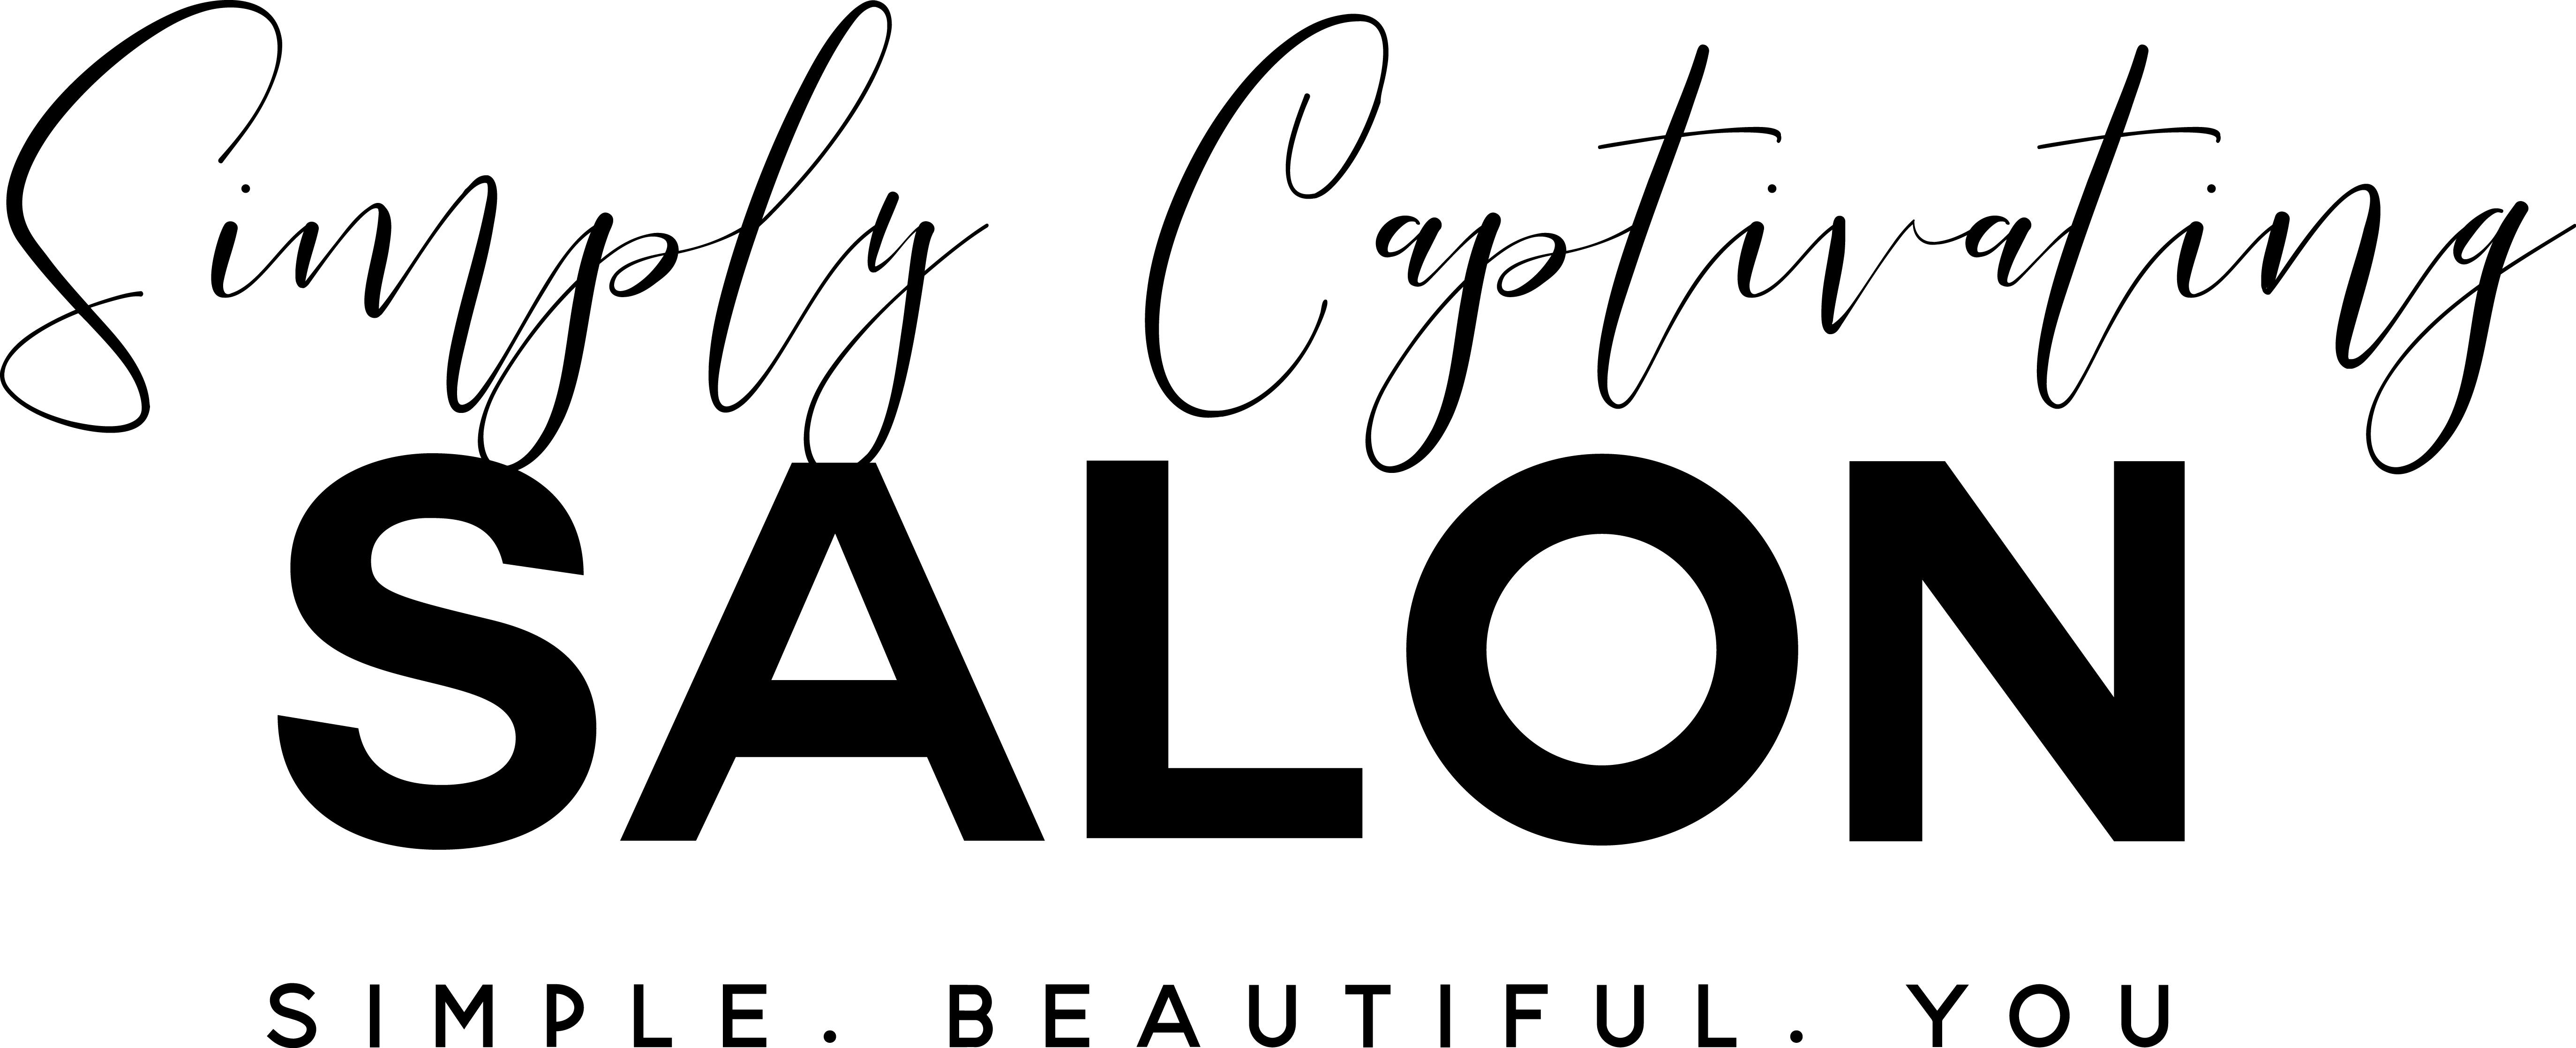 Simply Captivating Salon